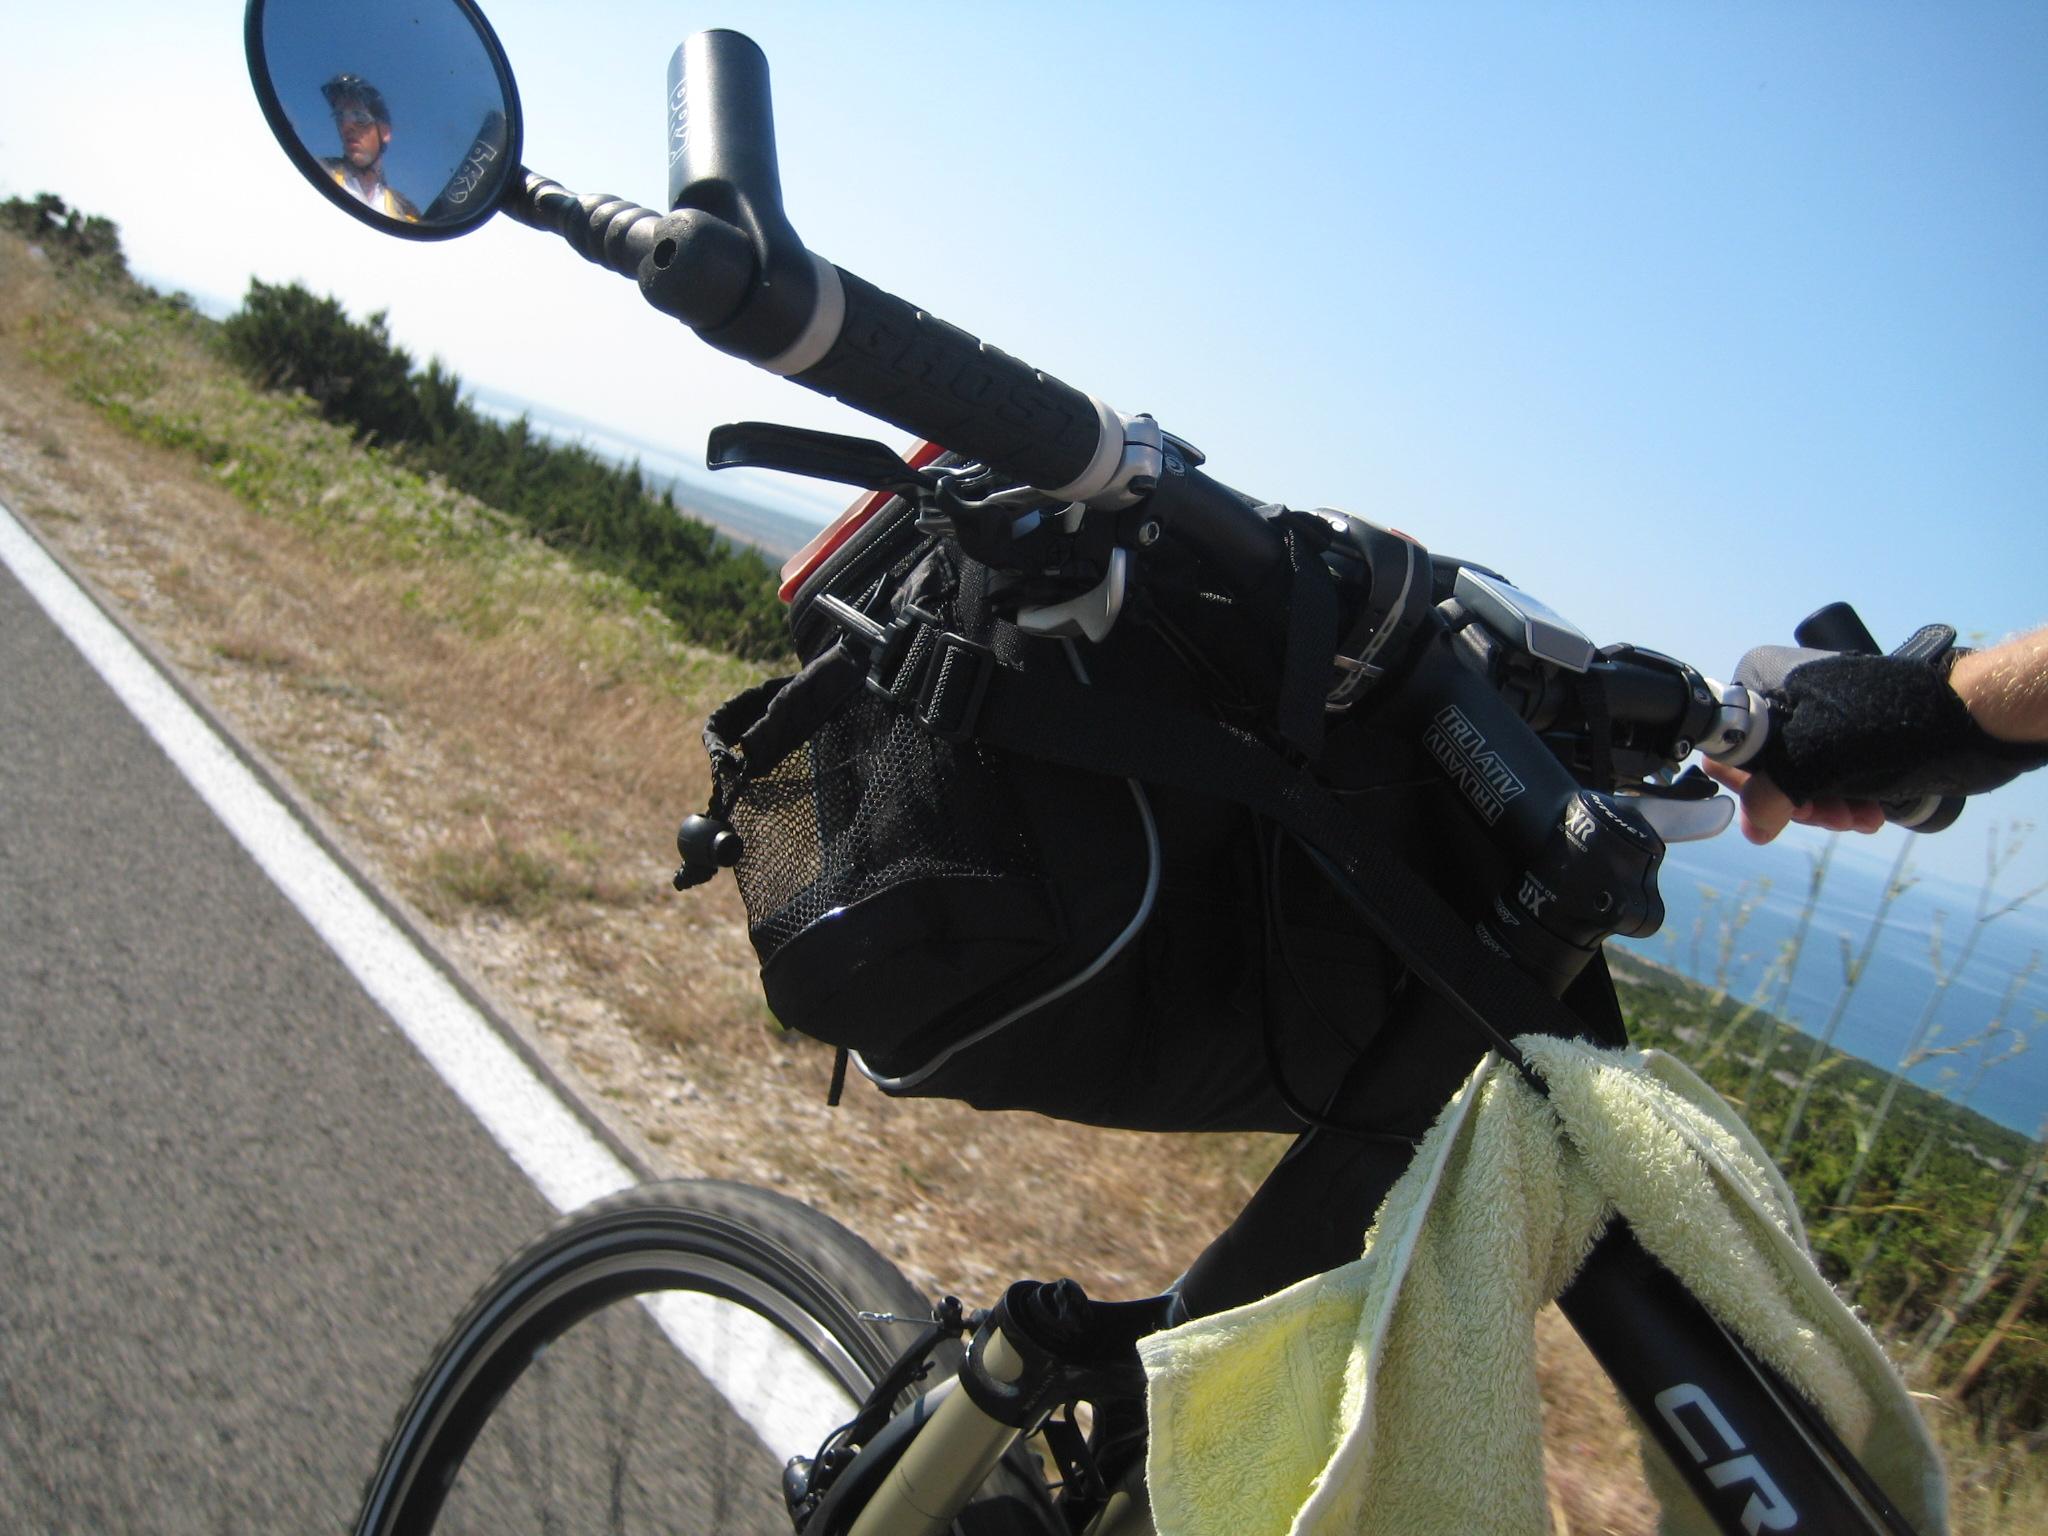 kolesarsko potovanja po jadranu